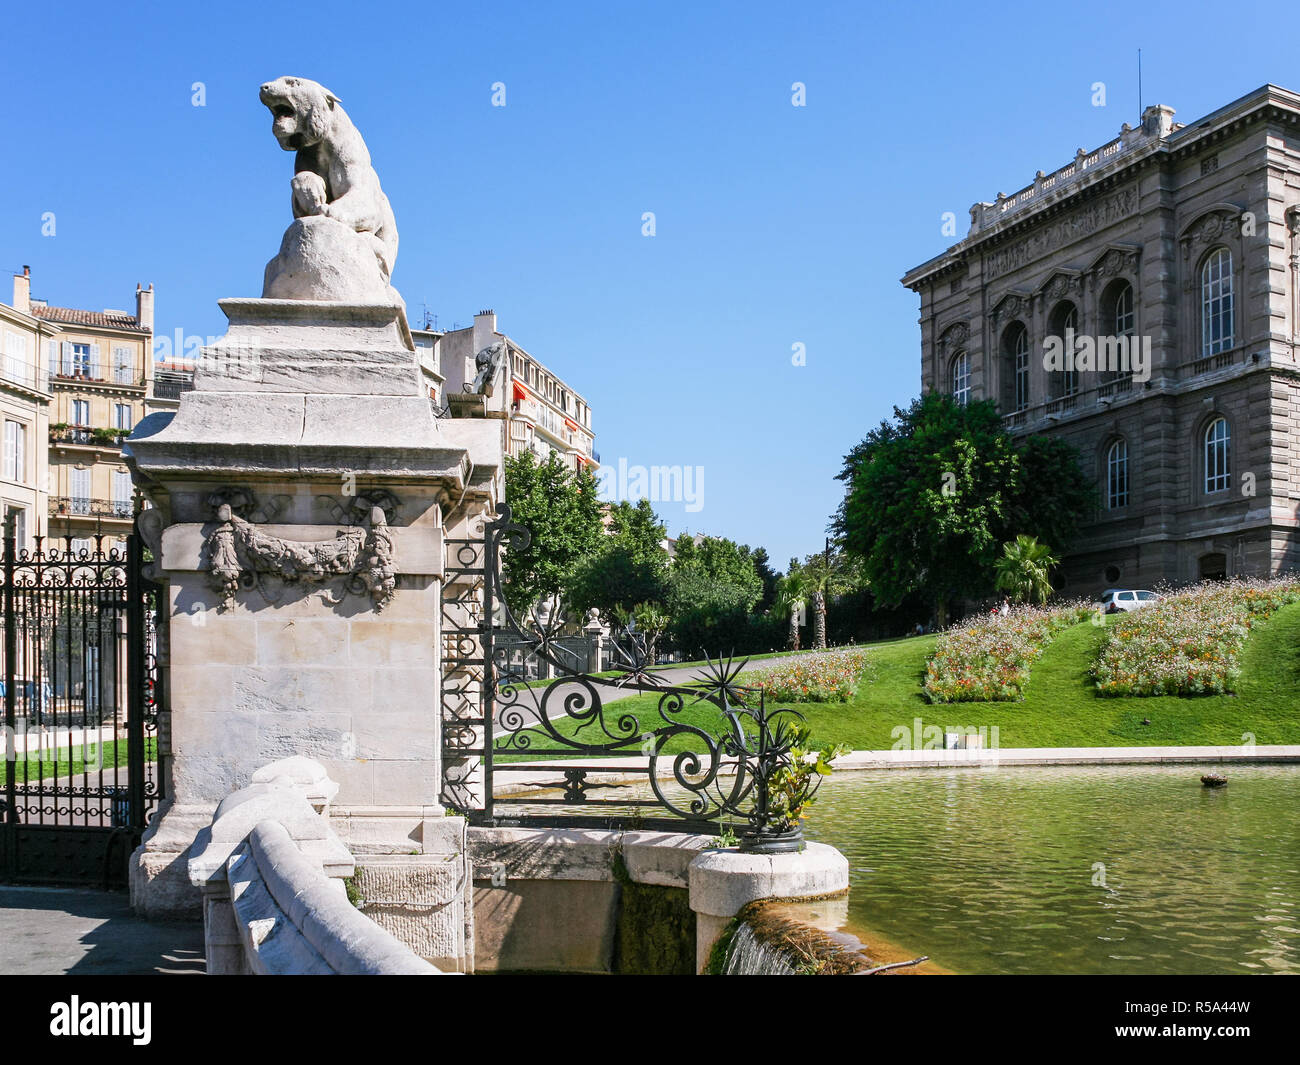 Lion statue on gate of Palais Longchamp - Stock Image